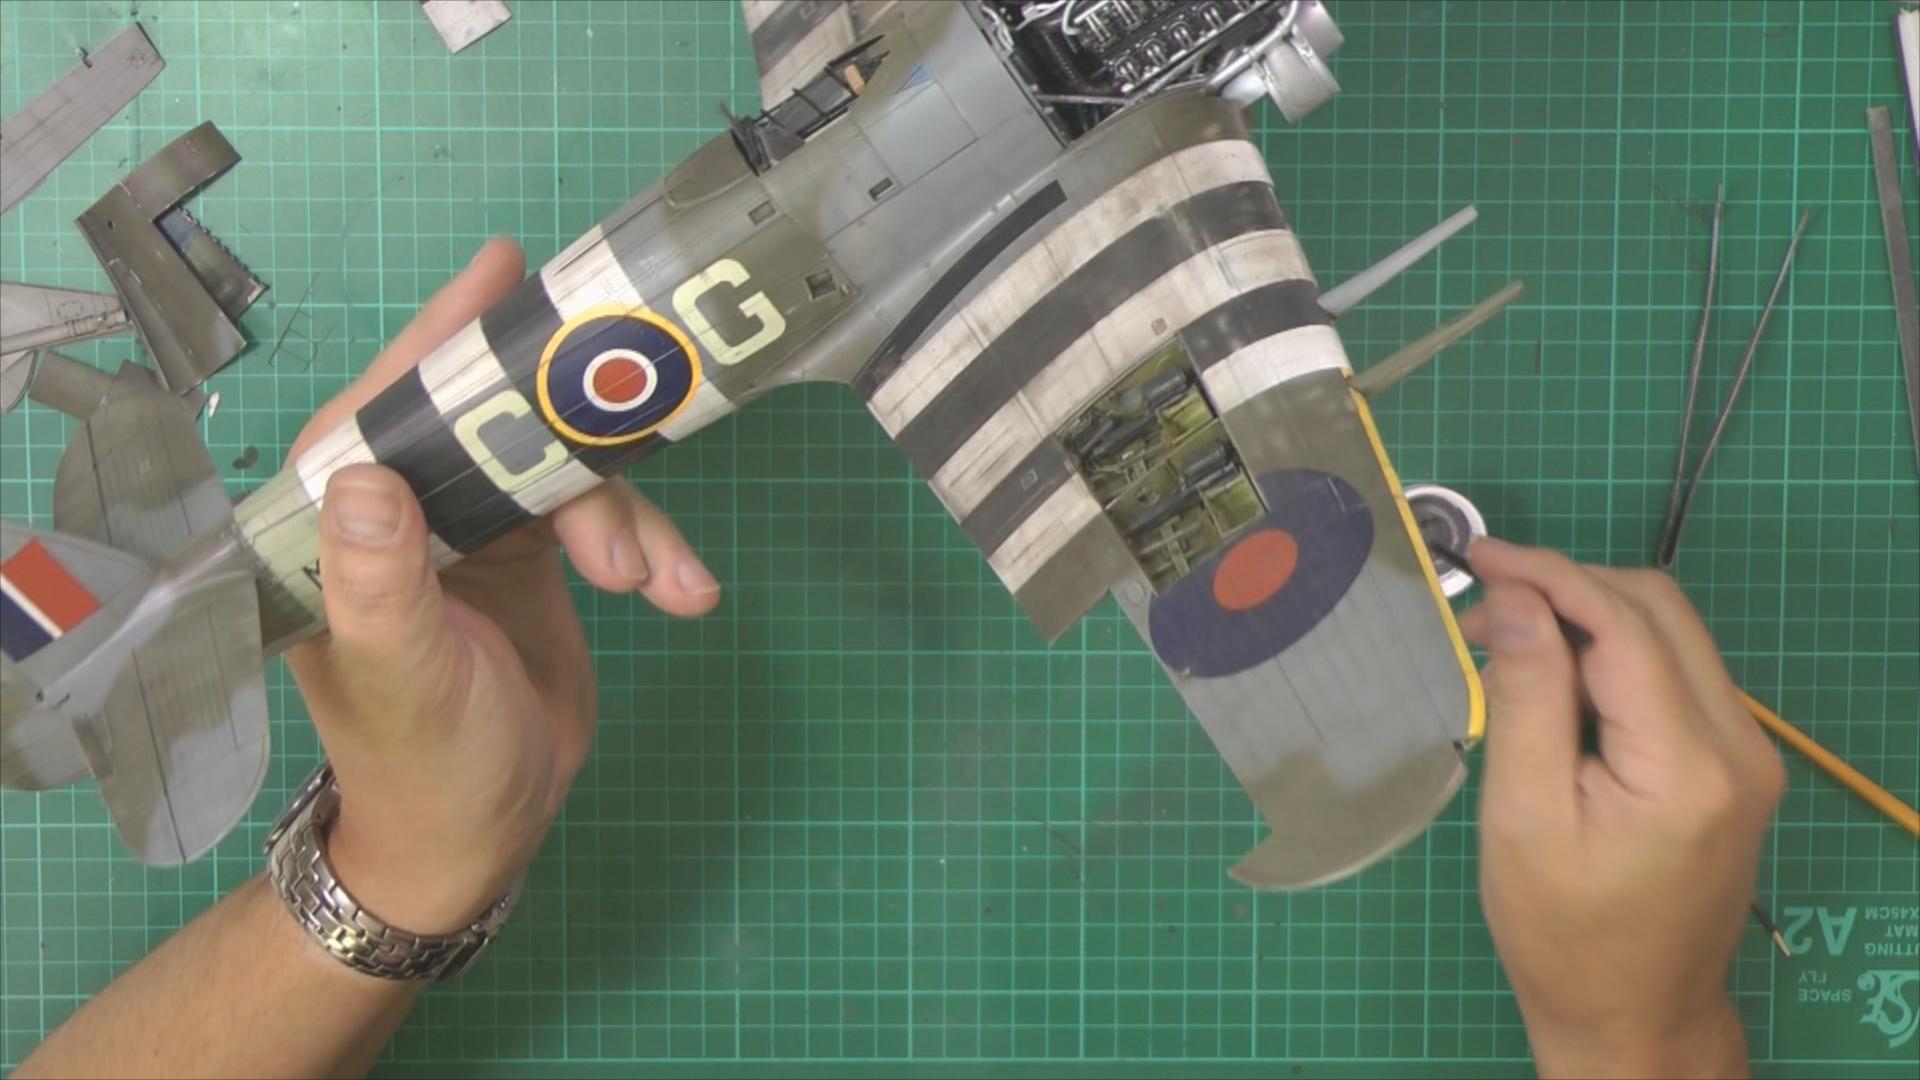 Hawker+Typhoon+Part+11+Pic+2.jpg